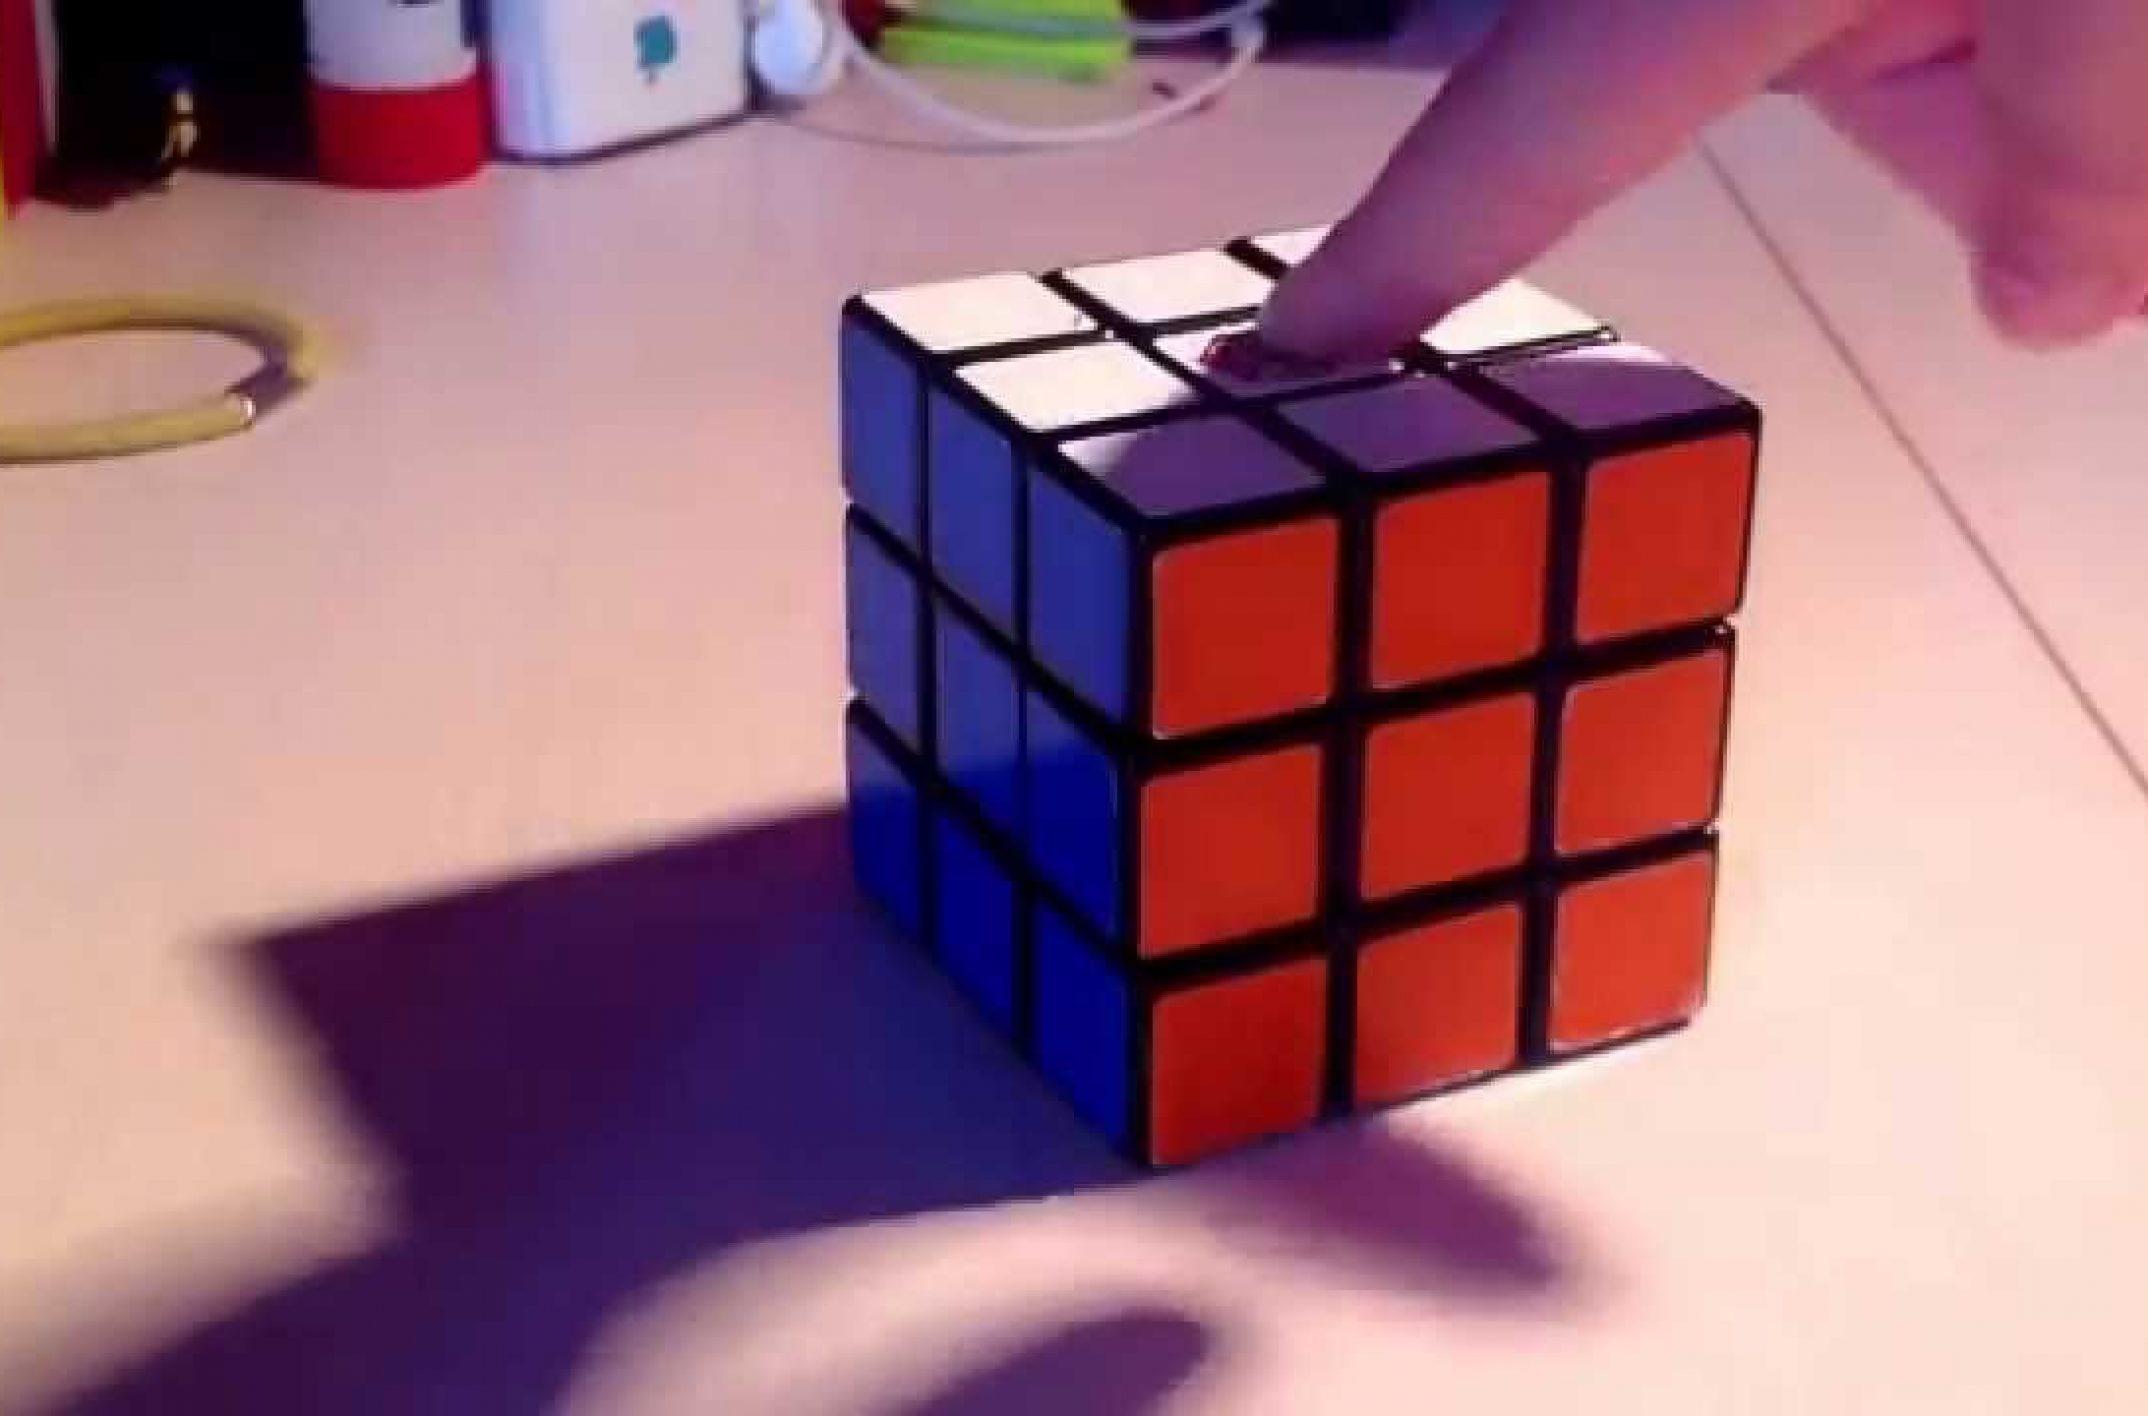 Comment reussir un rubik cube ?